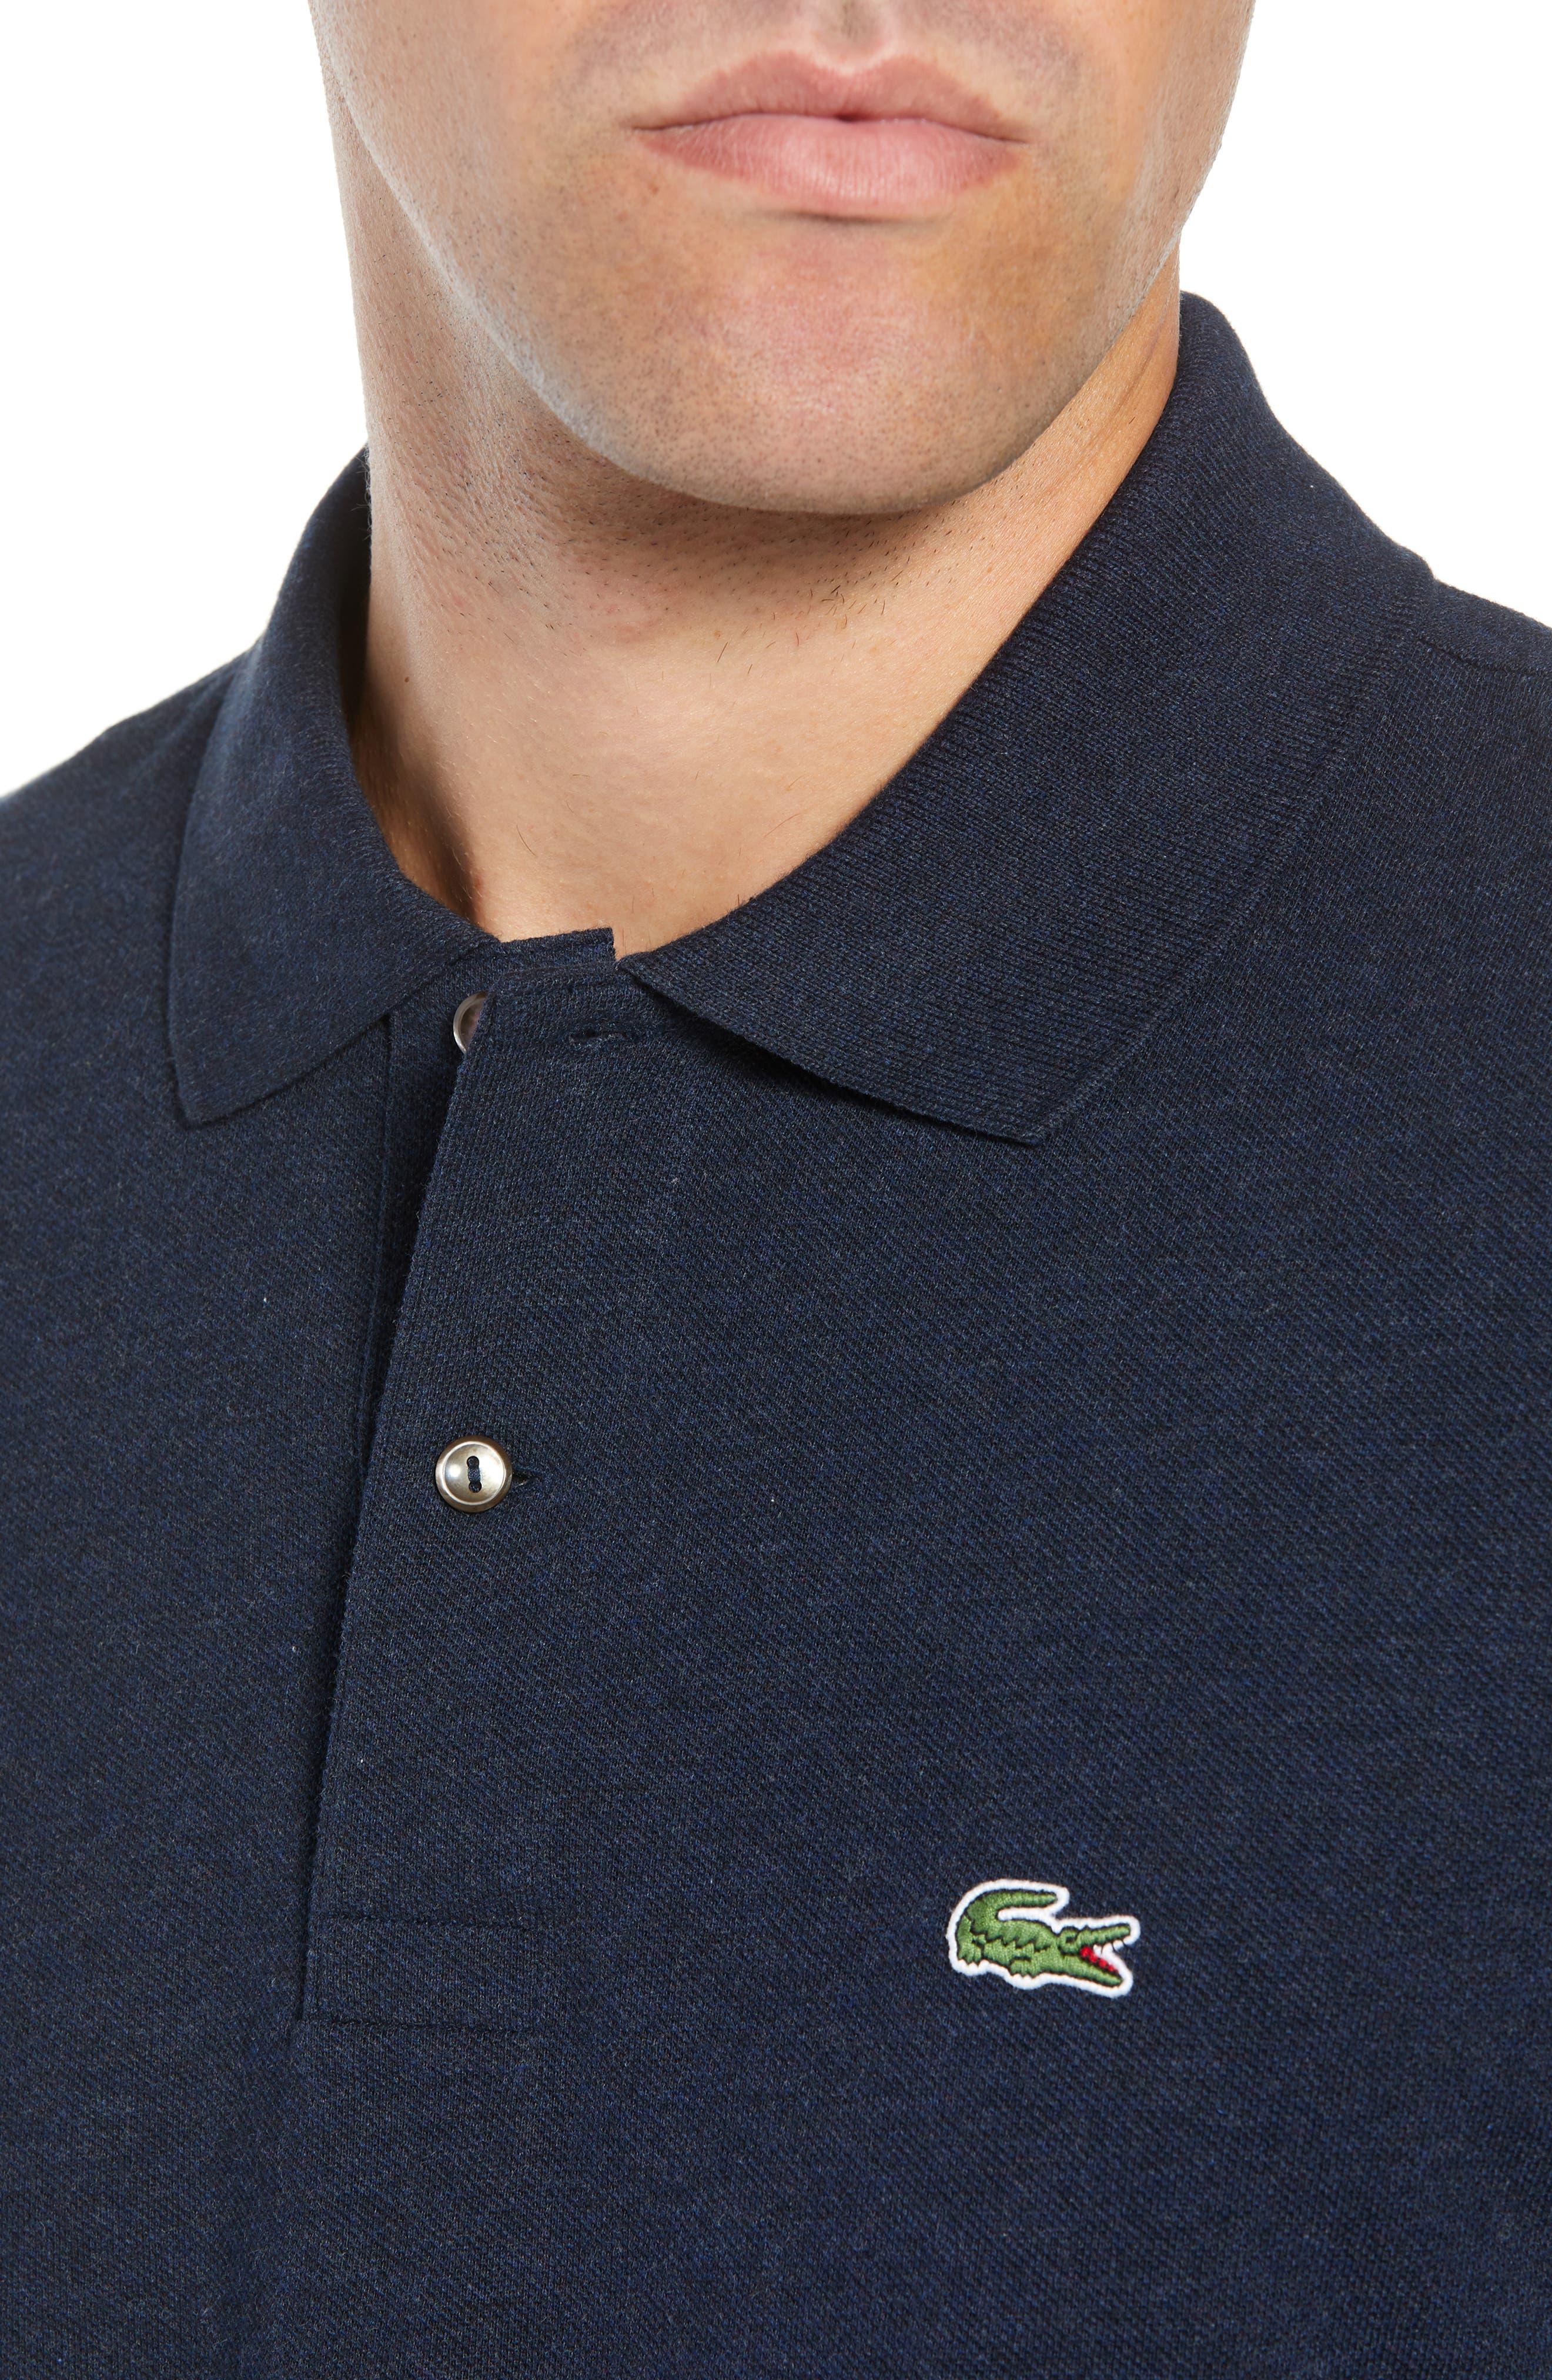 LACOSTE, Long Sleeve Piqué Polo, Alternate thumbnail 4, color, ECLIPSE BLUE CHINE